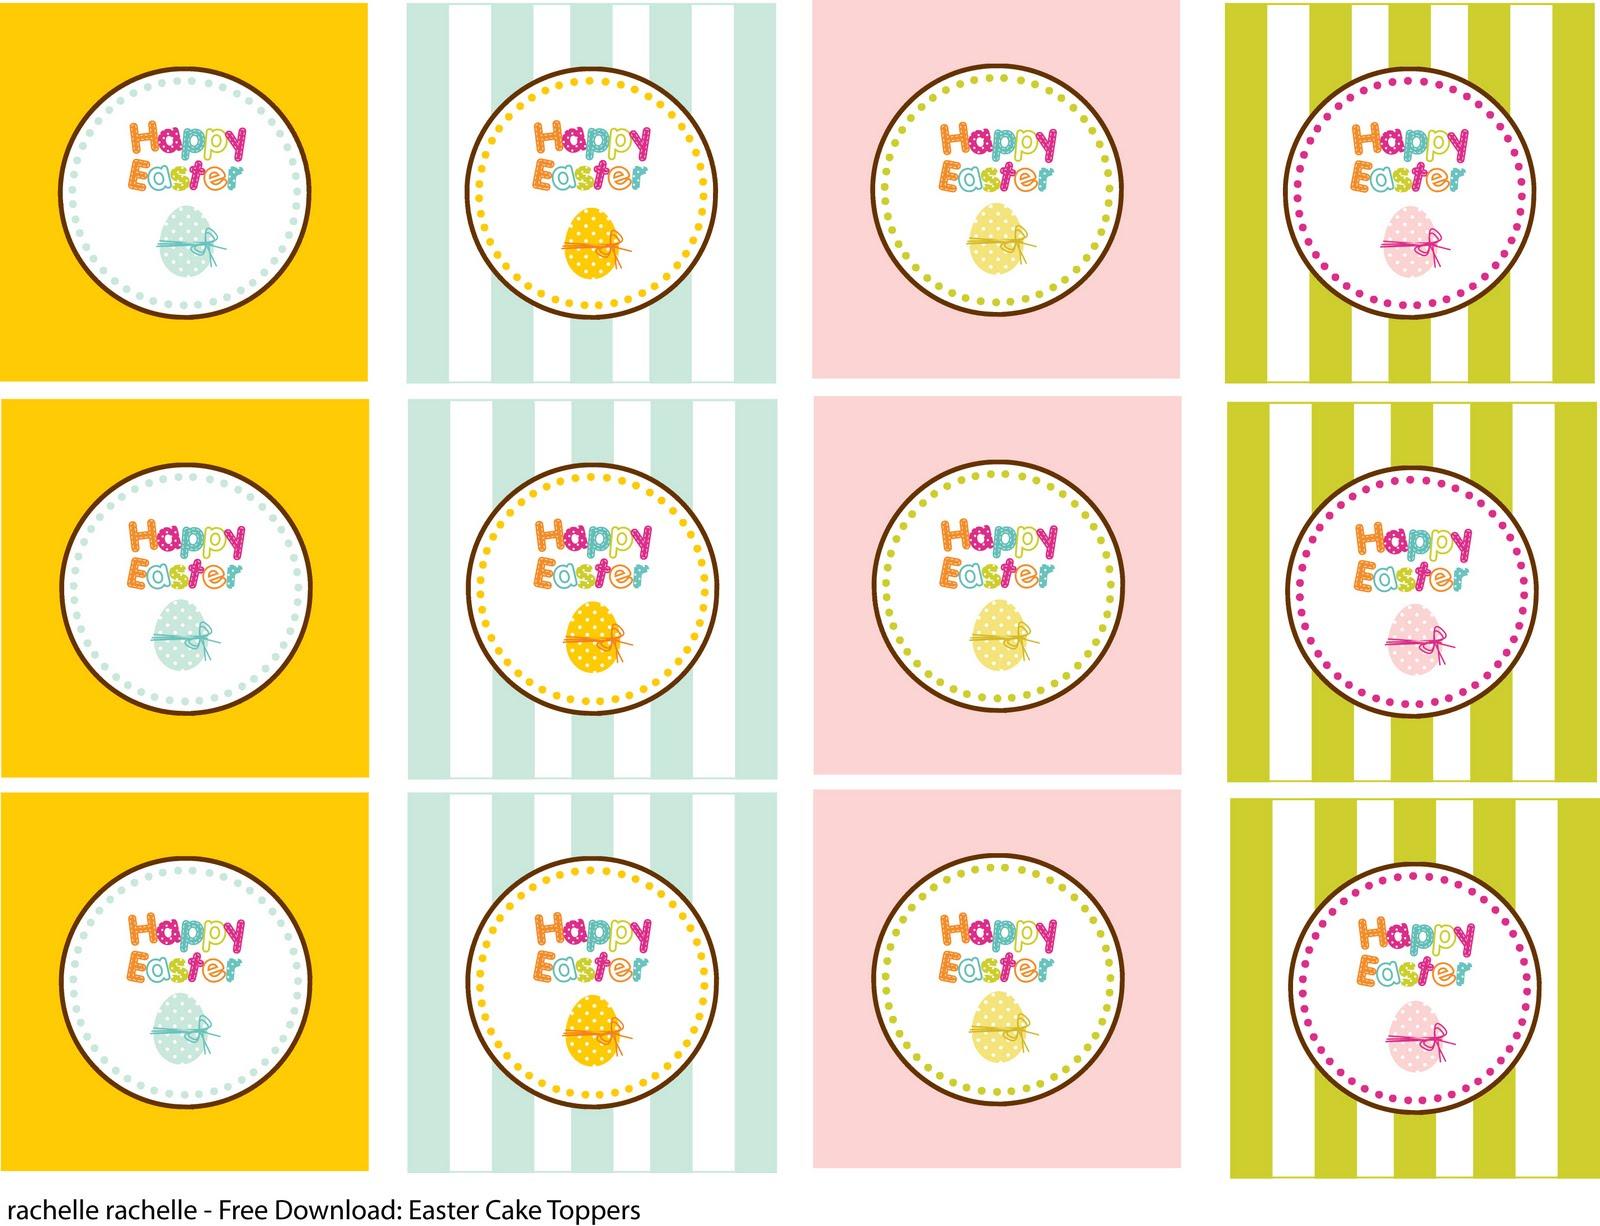 http://4.bp.blogspot.com/-XXC4Ps7pK50/Tau3uxdzUrI/AAAAAAAAACk/RdlS4JxWlp4/s1600/happy+easter+cake+toppers.jpg